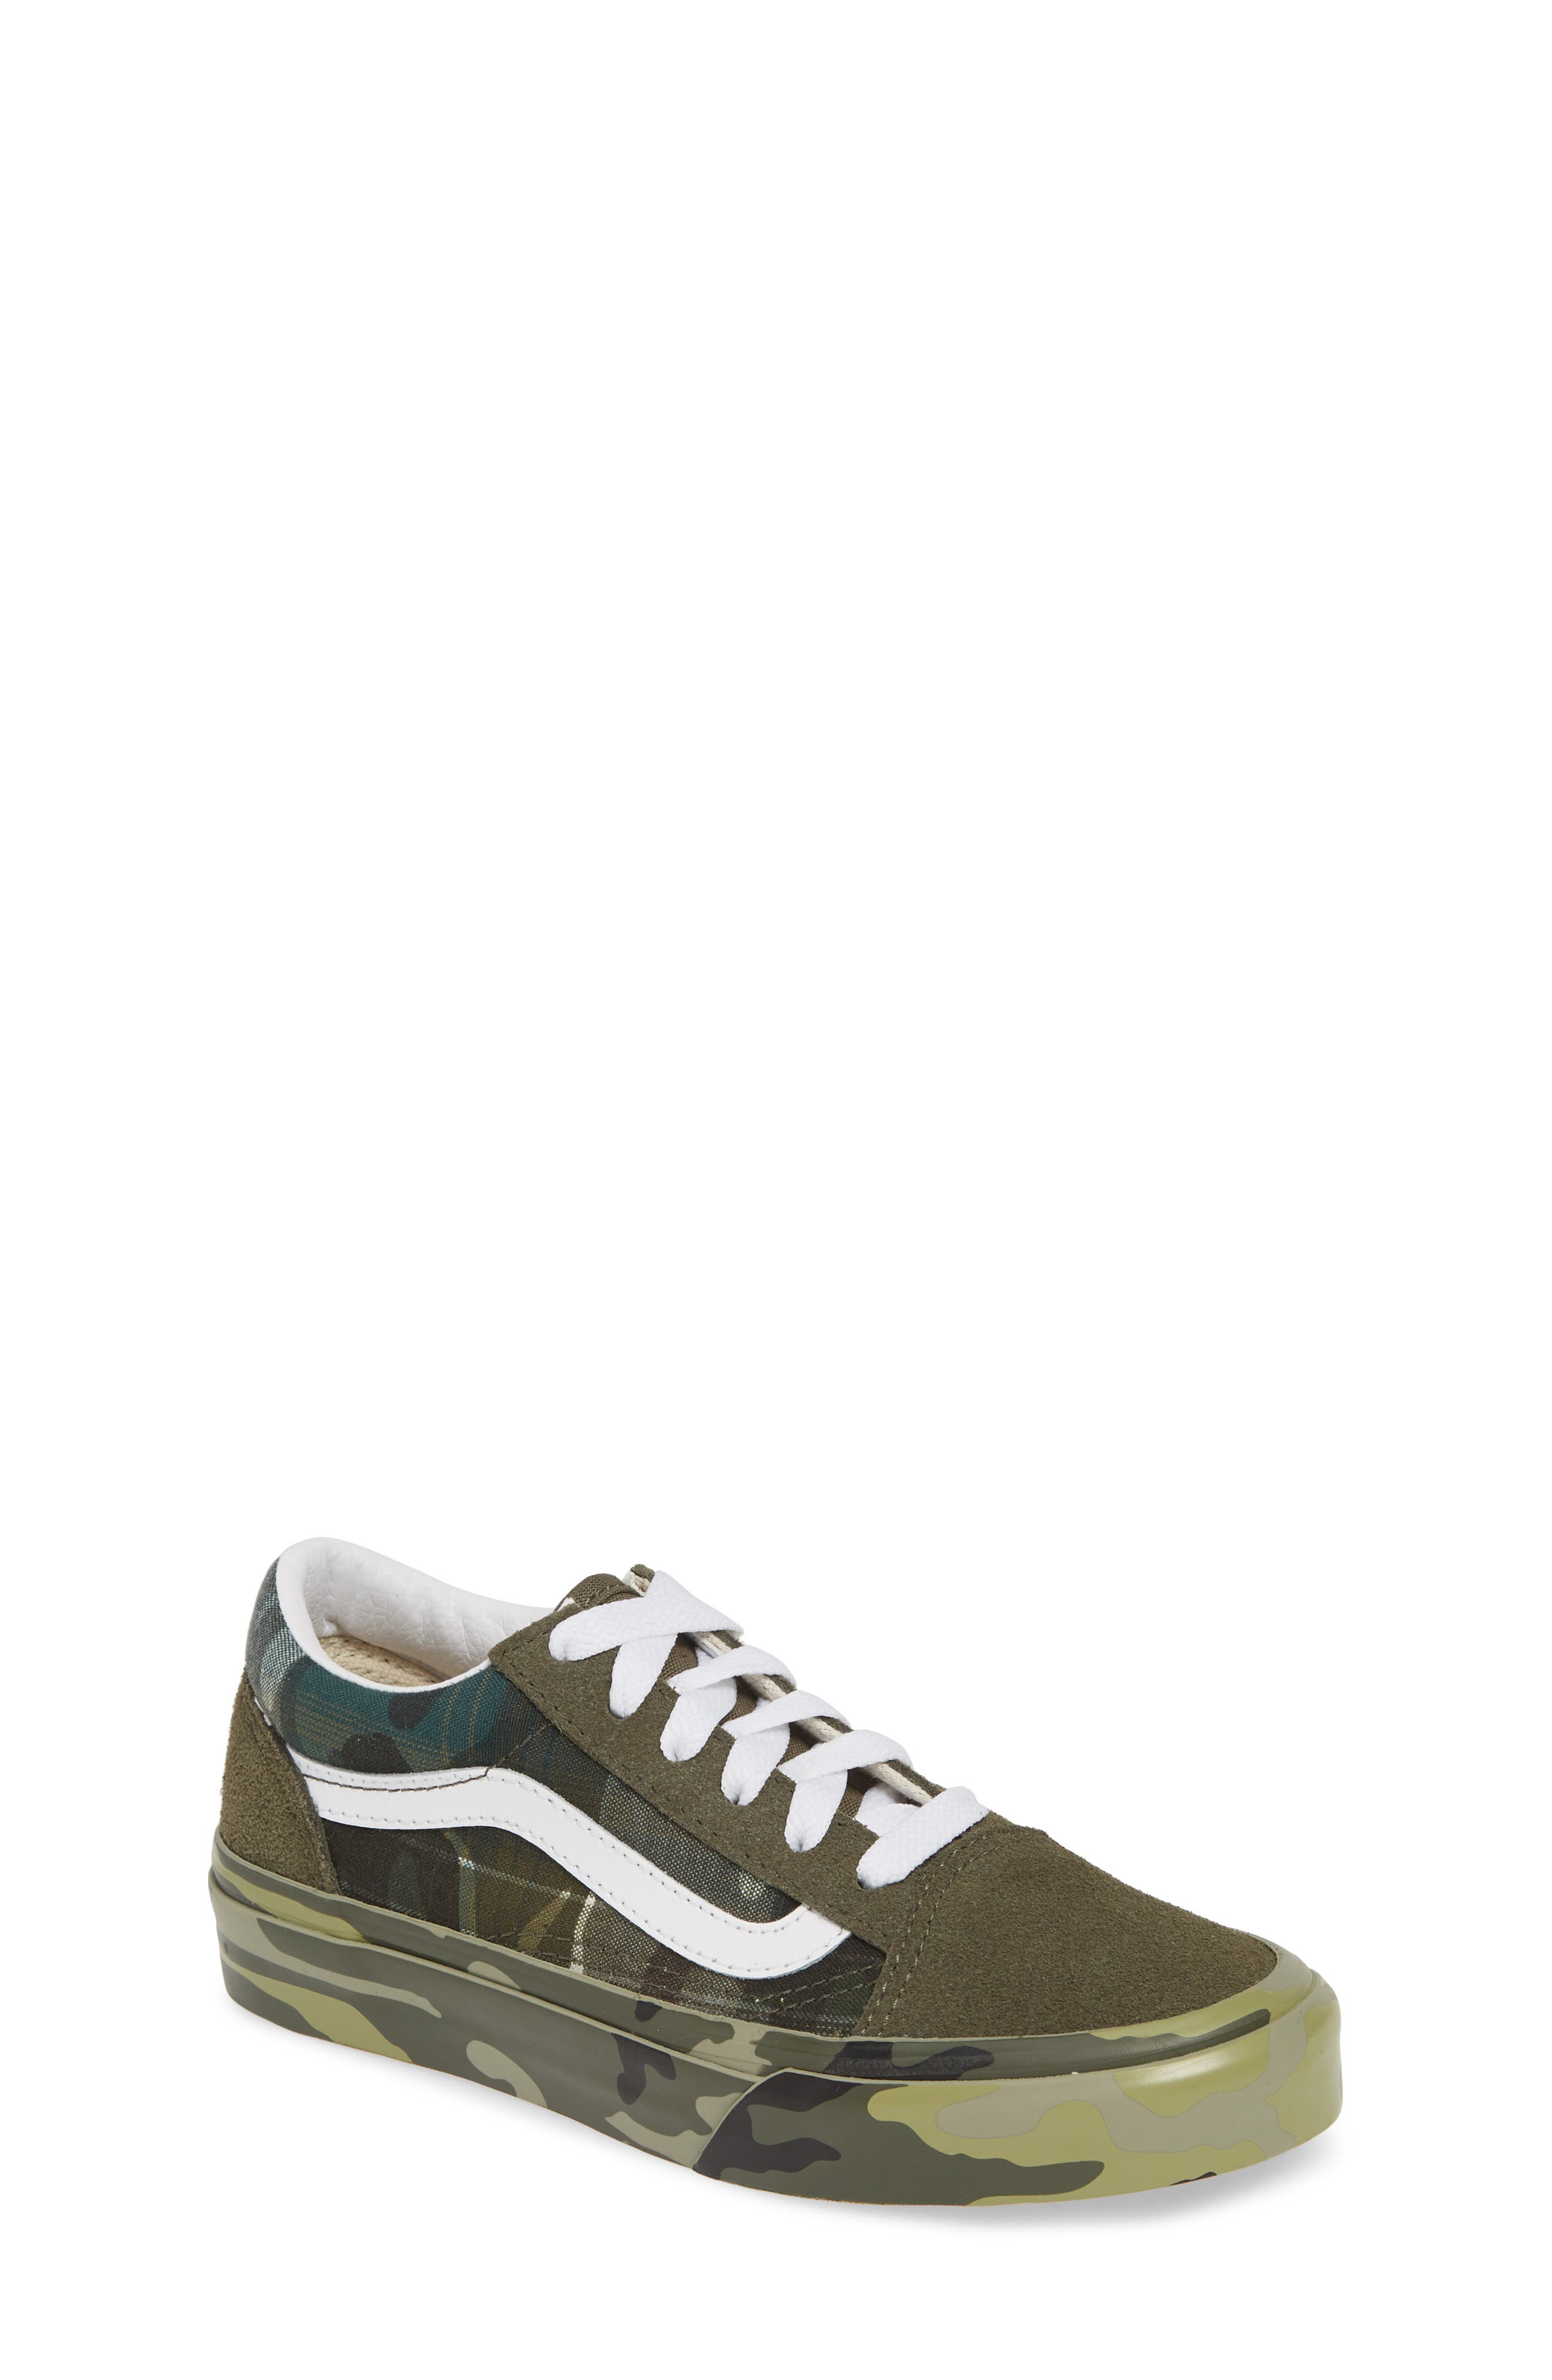 VANS Old Skool Sneaker, Main, color, PLAID CAMO GRAPE LEAF/ WHITE